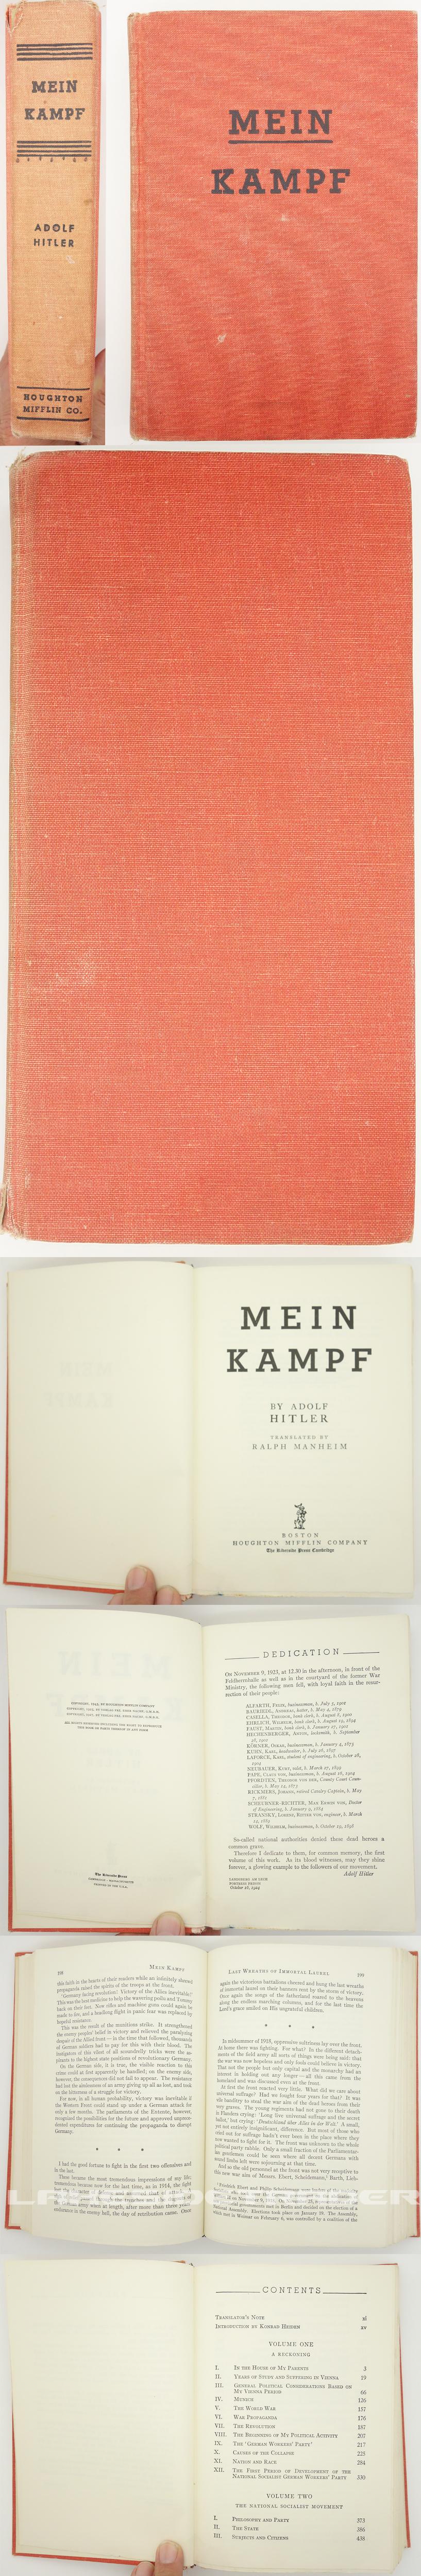 Mein Kampf 1943 English Version